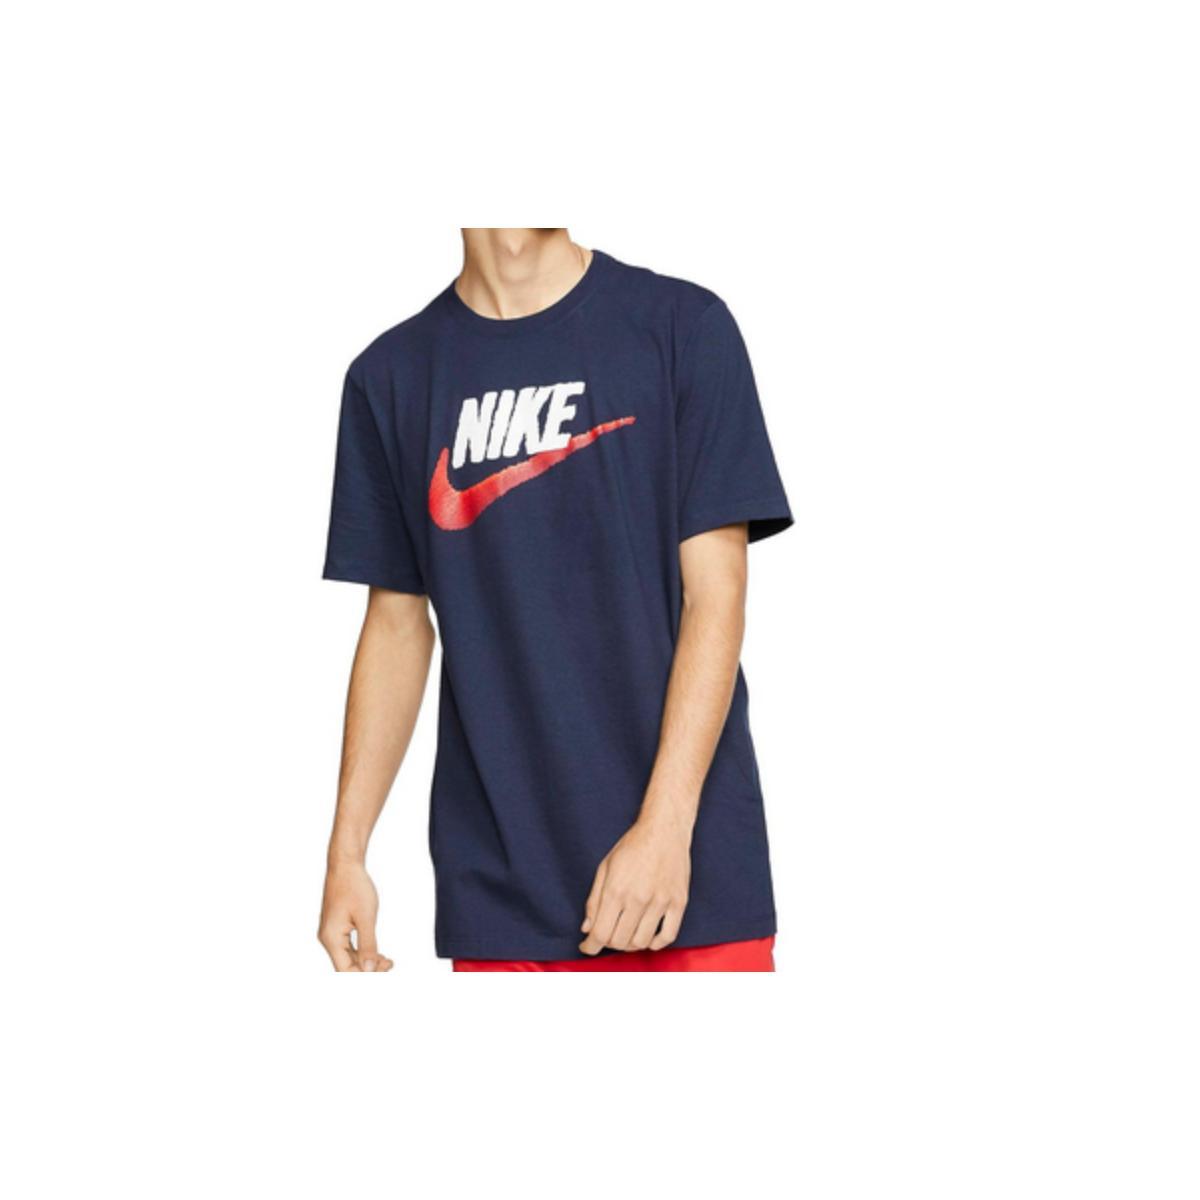 Camiseta Masculina Nike Ar4993-452 Sportswear Marinho/branco